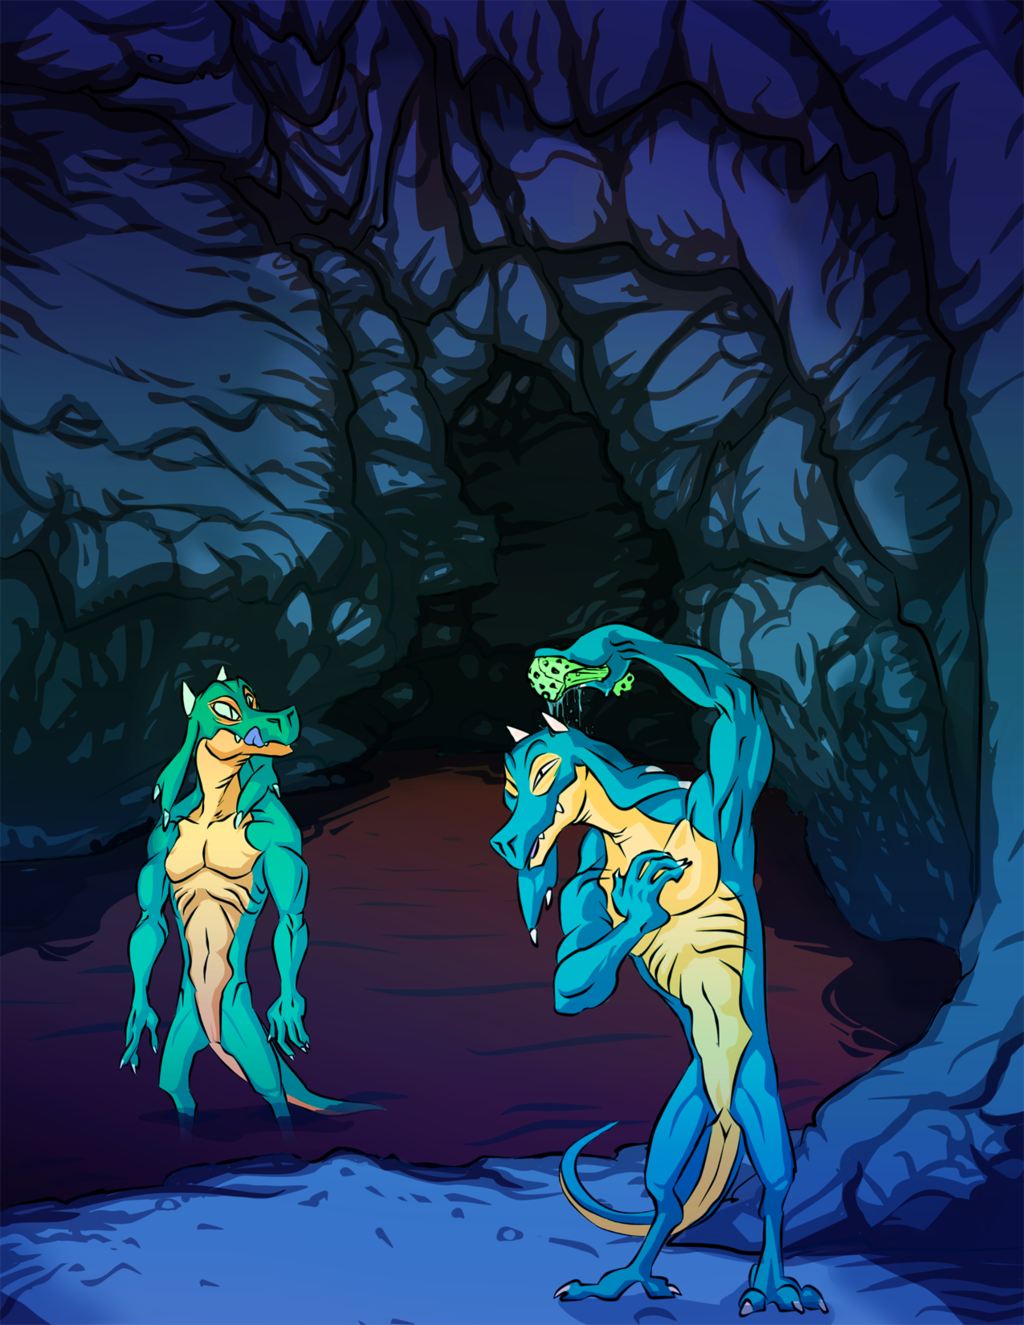 Reptile duo's Grotto (Cool)